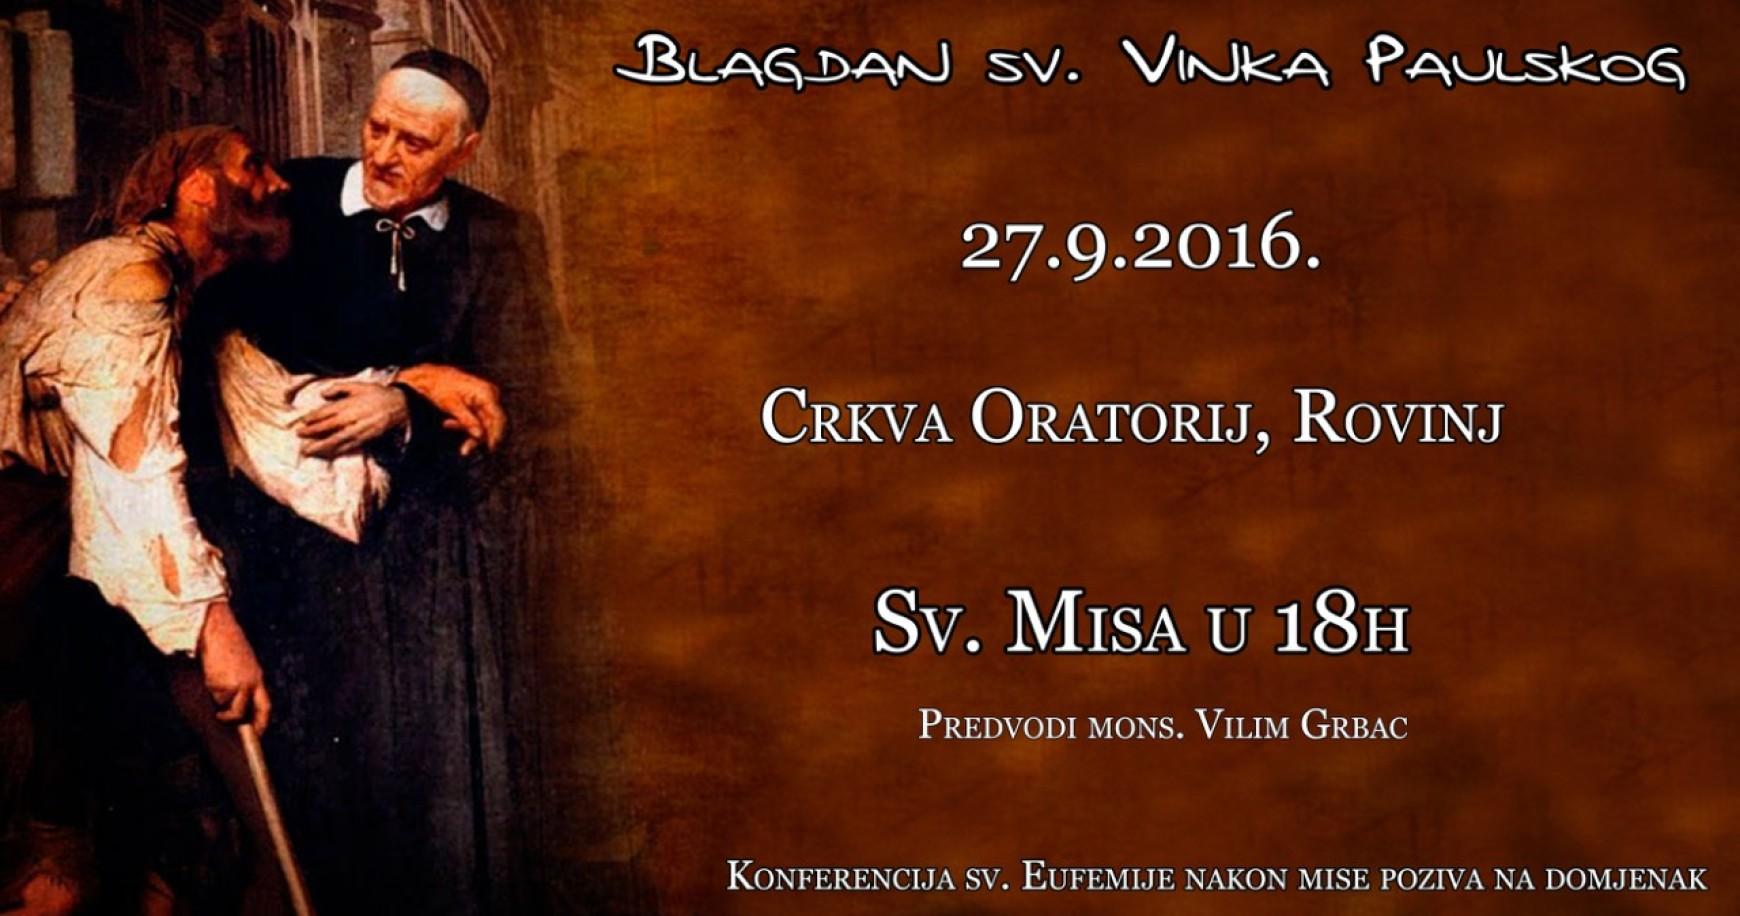 Blagdan sv. Vinka Paulskog